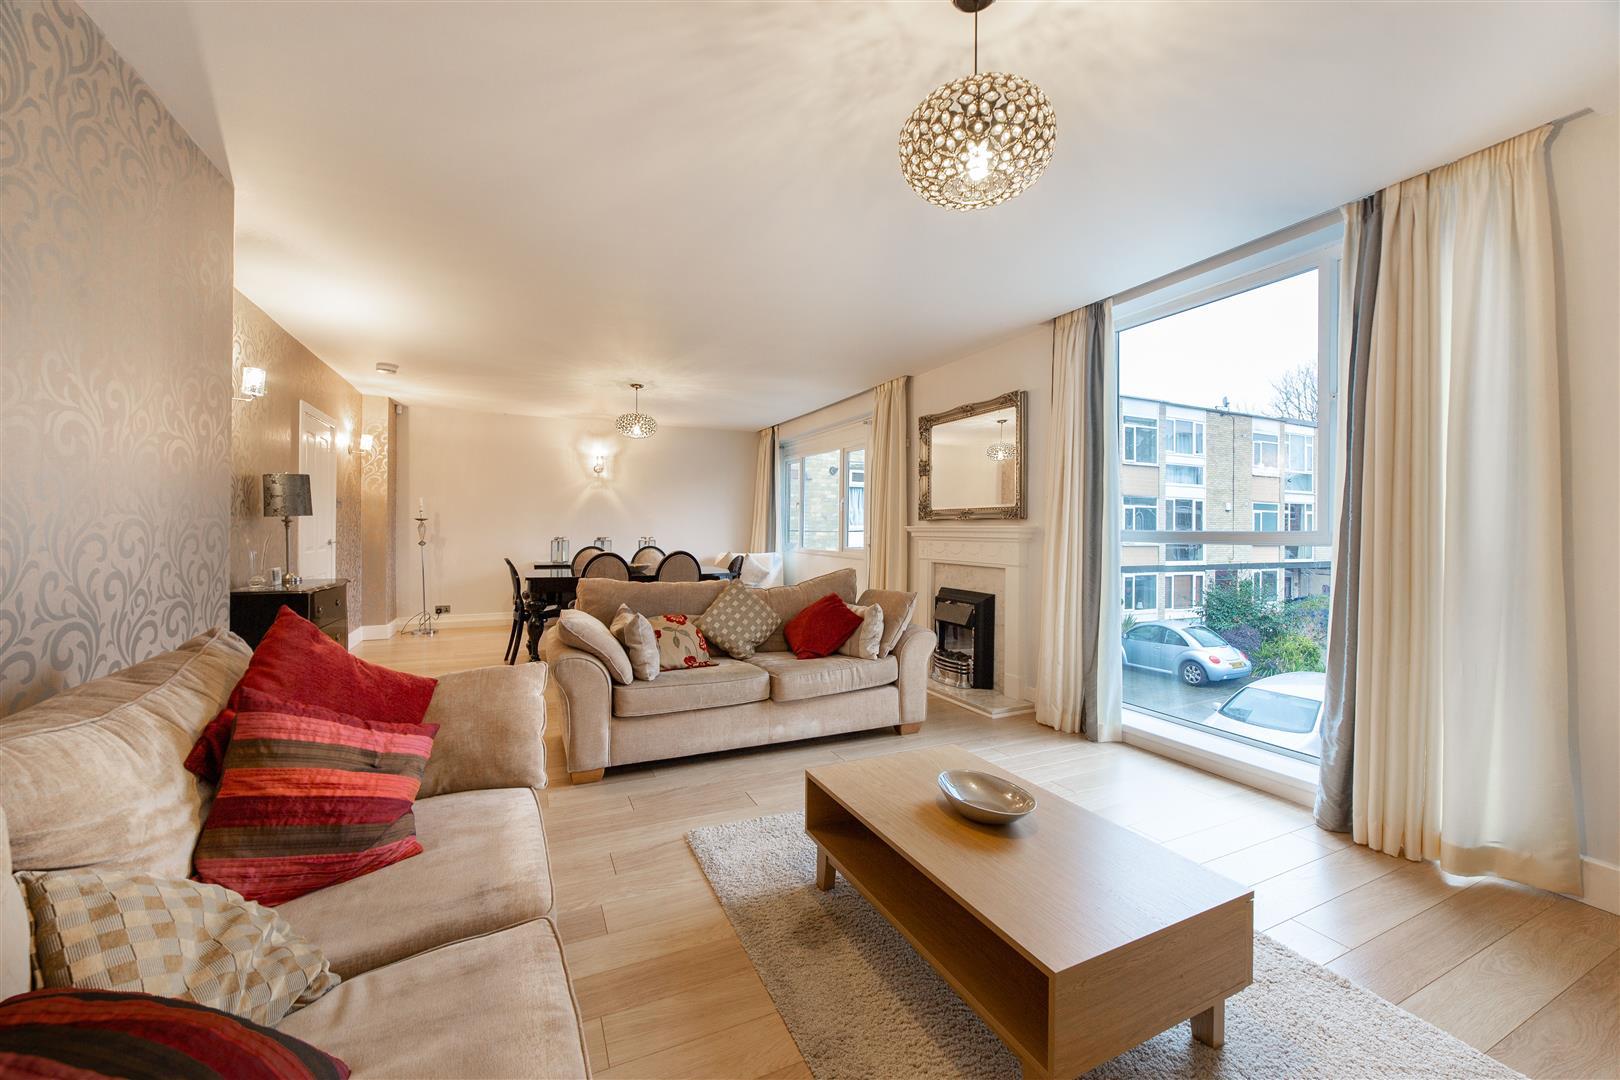 3 bed apartment to rent in Newcastle Upon Tyne, NE3 4YB, NE3